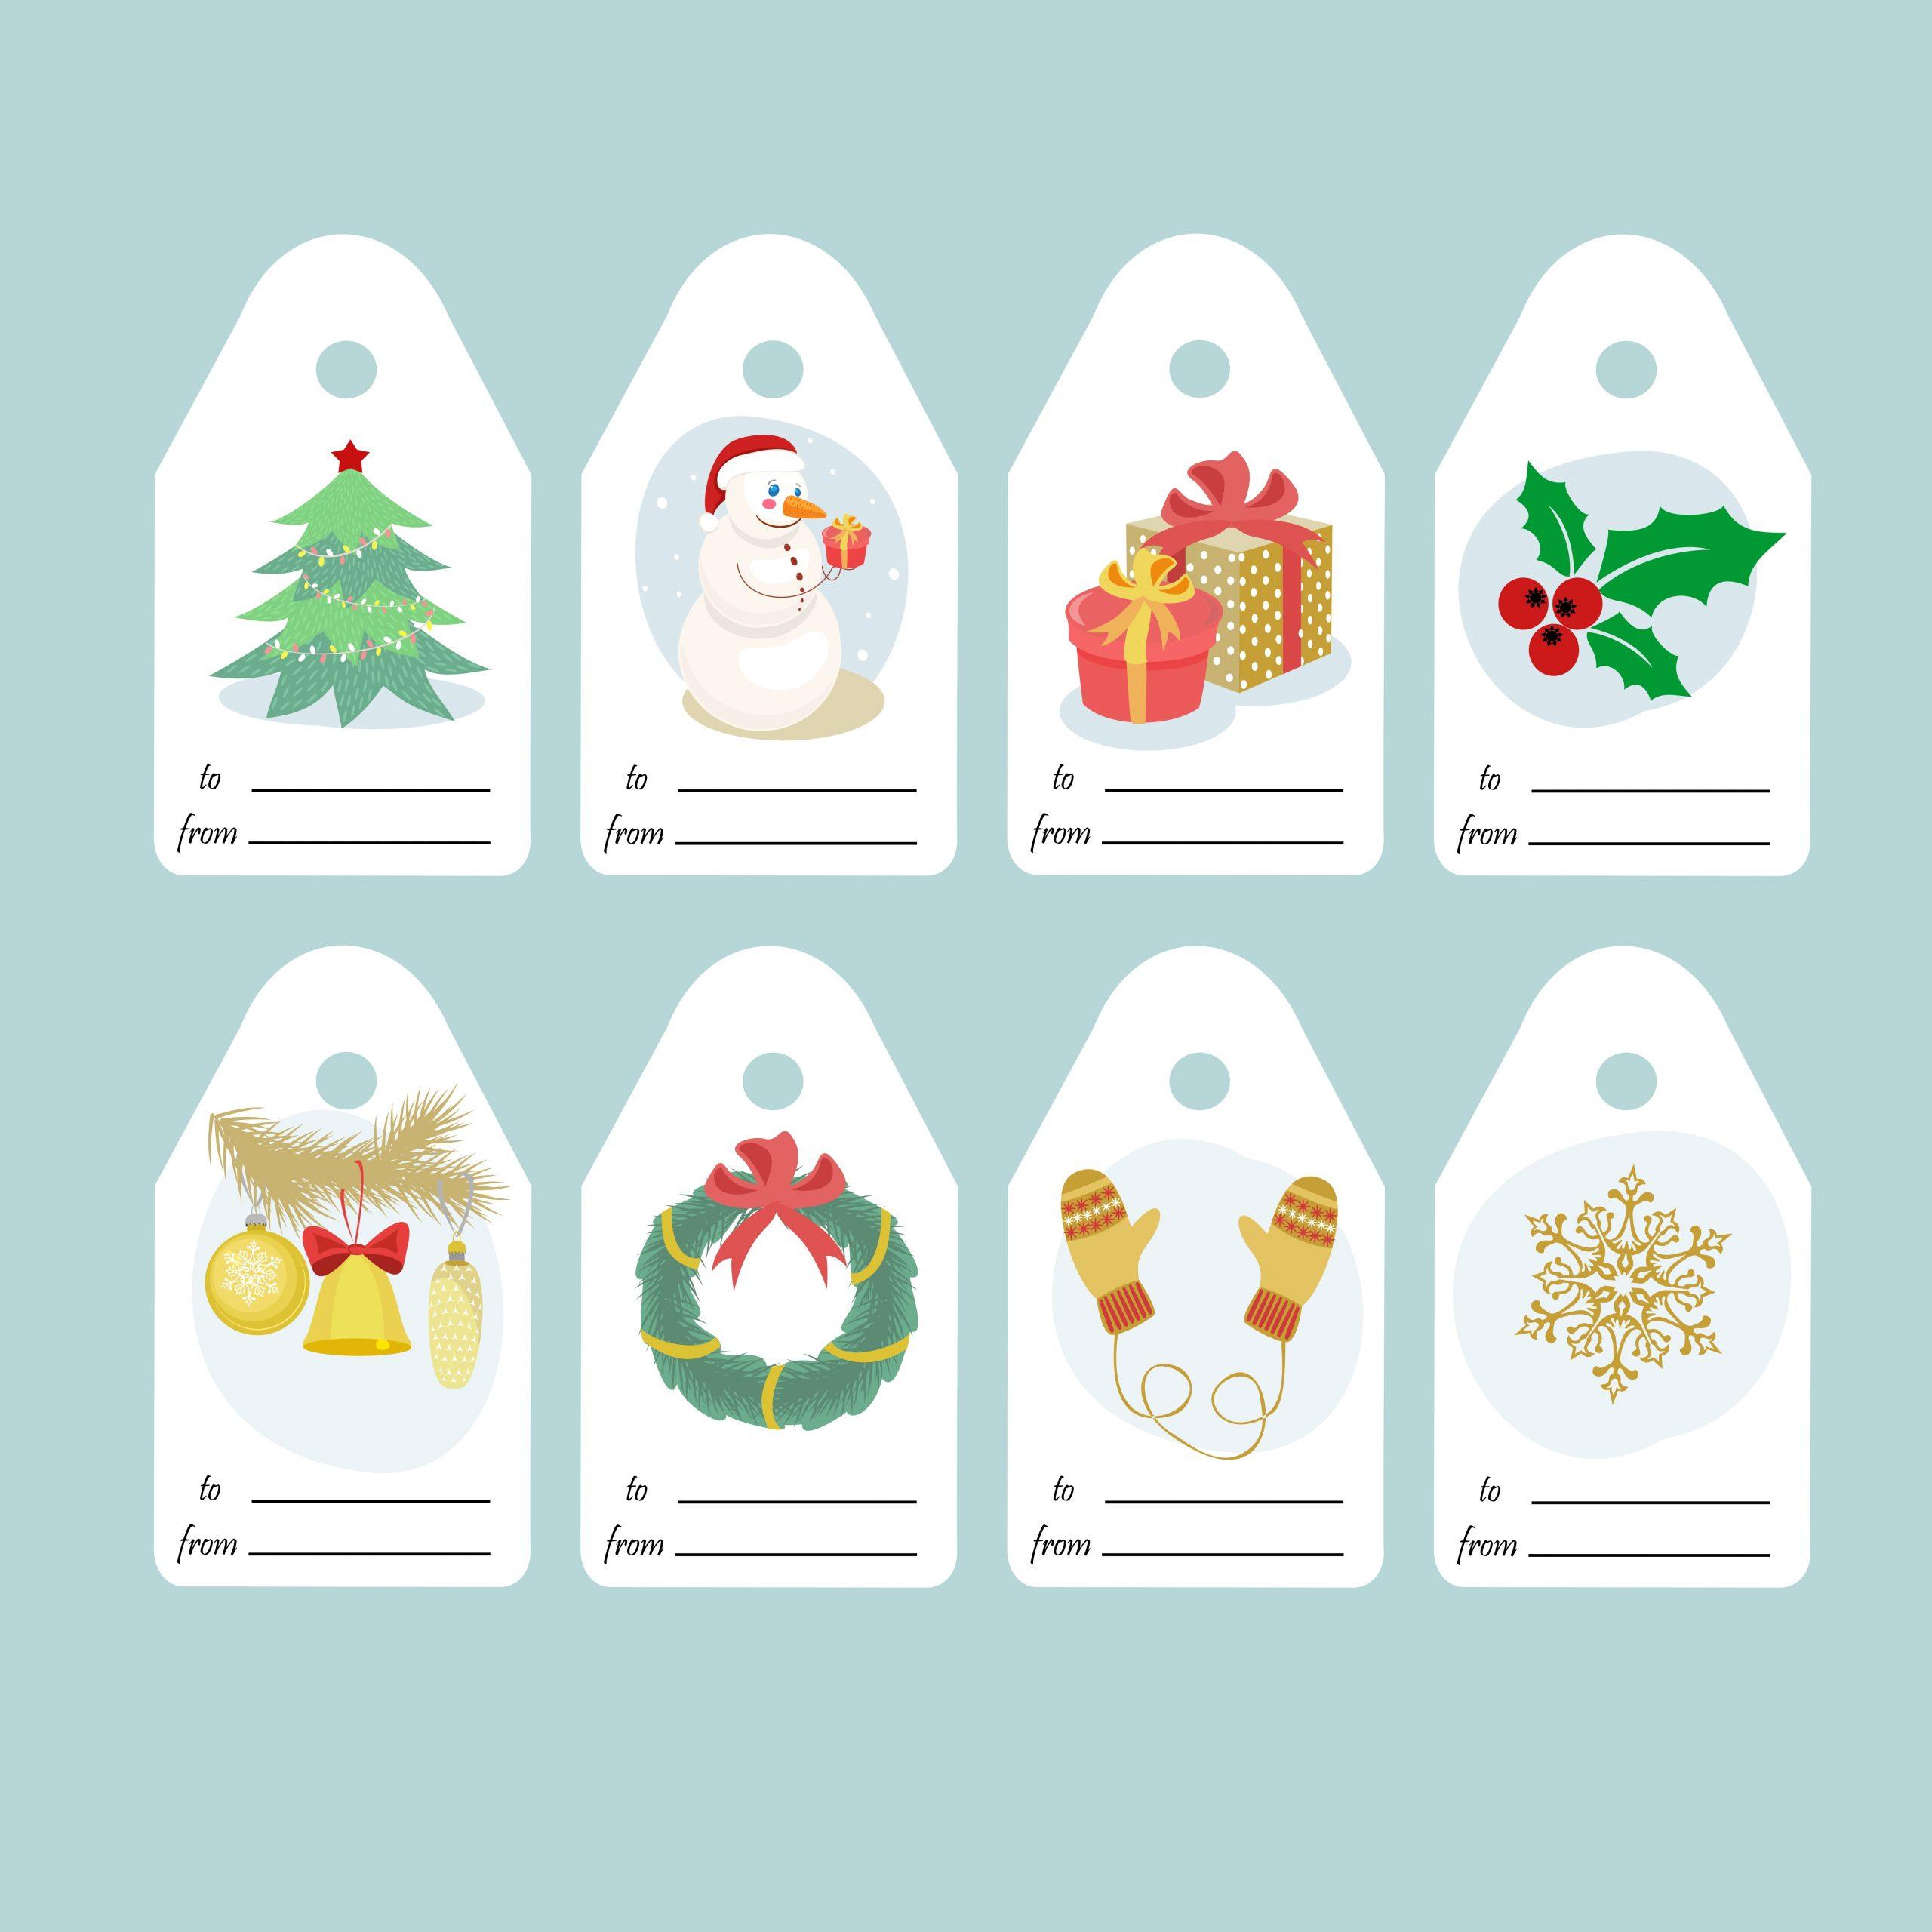 Etiquettes Cadeau De Noël À Imprimer - Un Max D'idées à Etiquette Cadeau Noel A Imprimer Gratuitement